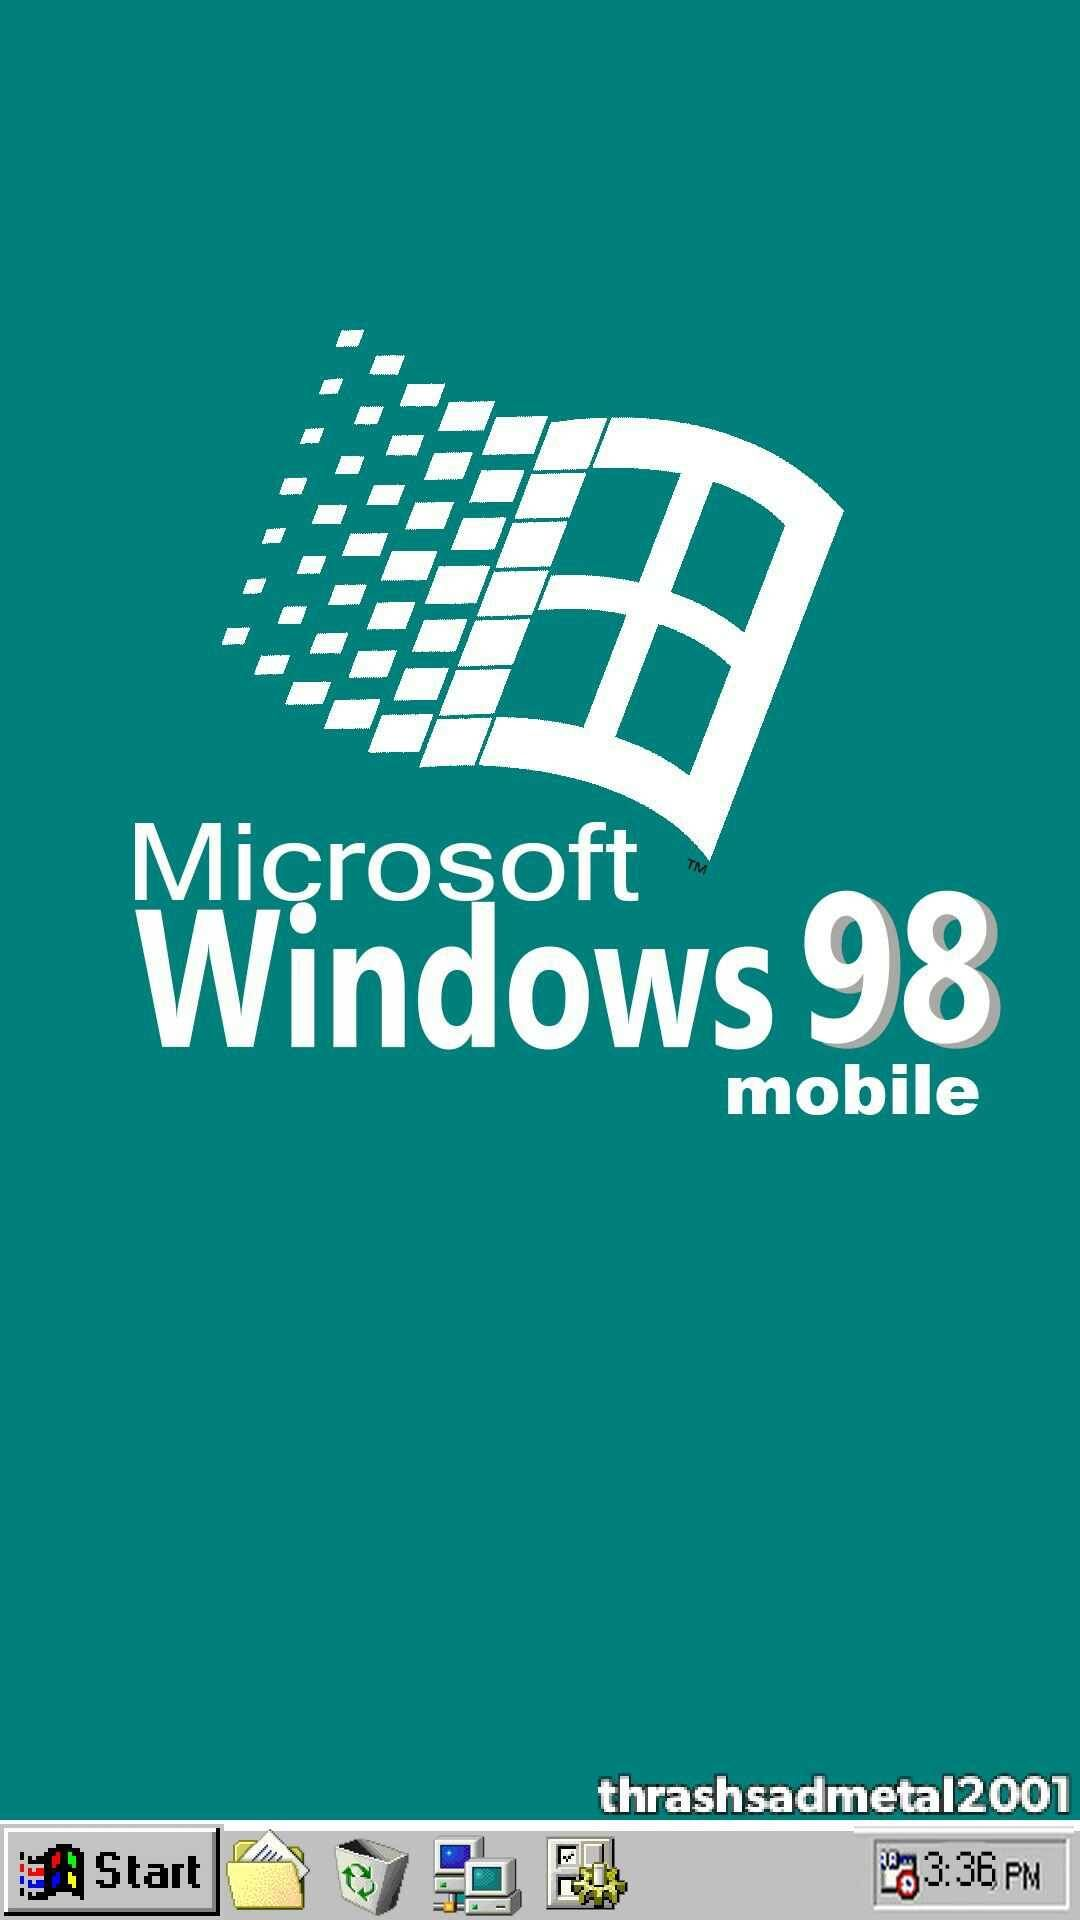 Thrashsadmetal2001 Windows 98 Mobile